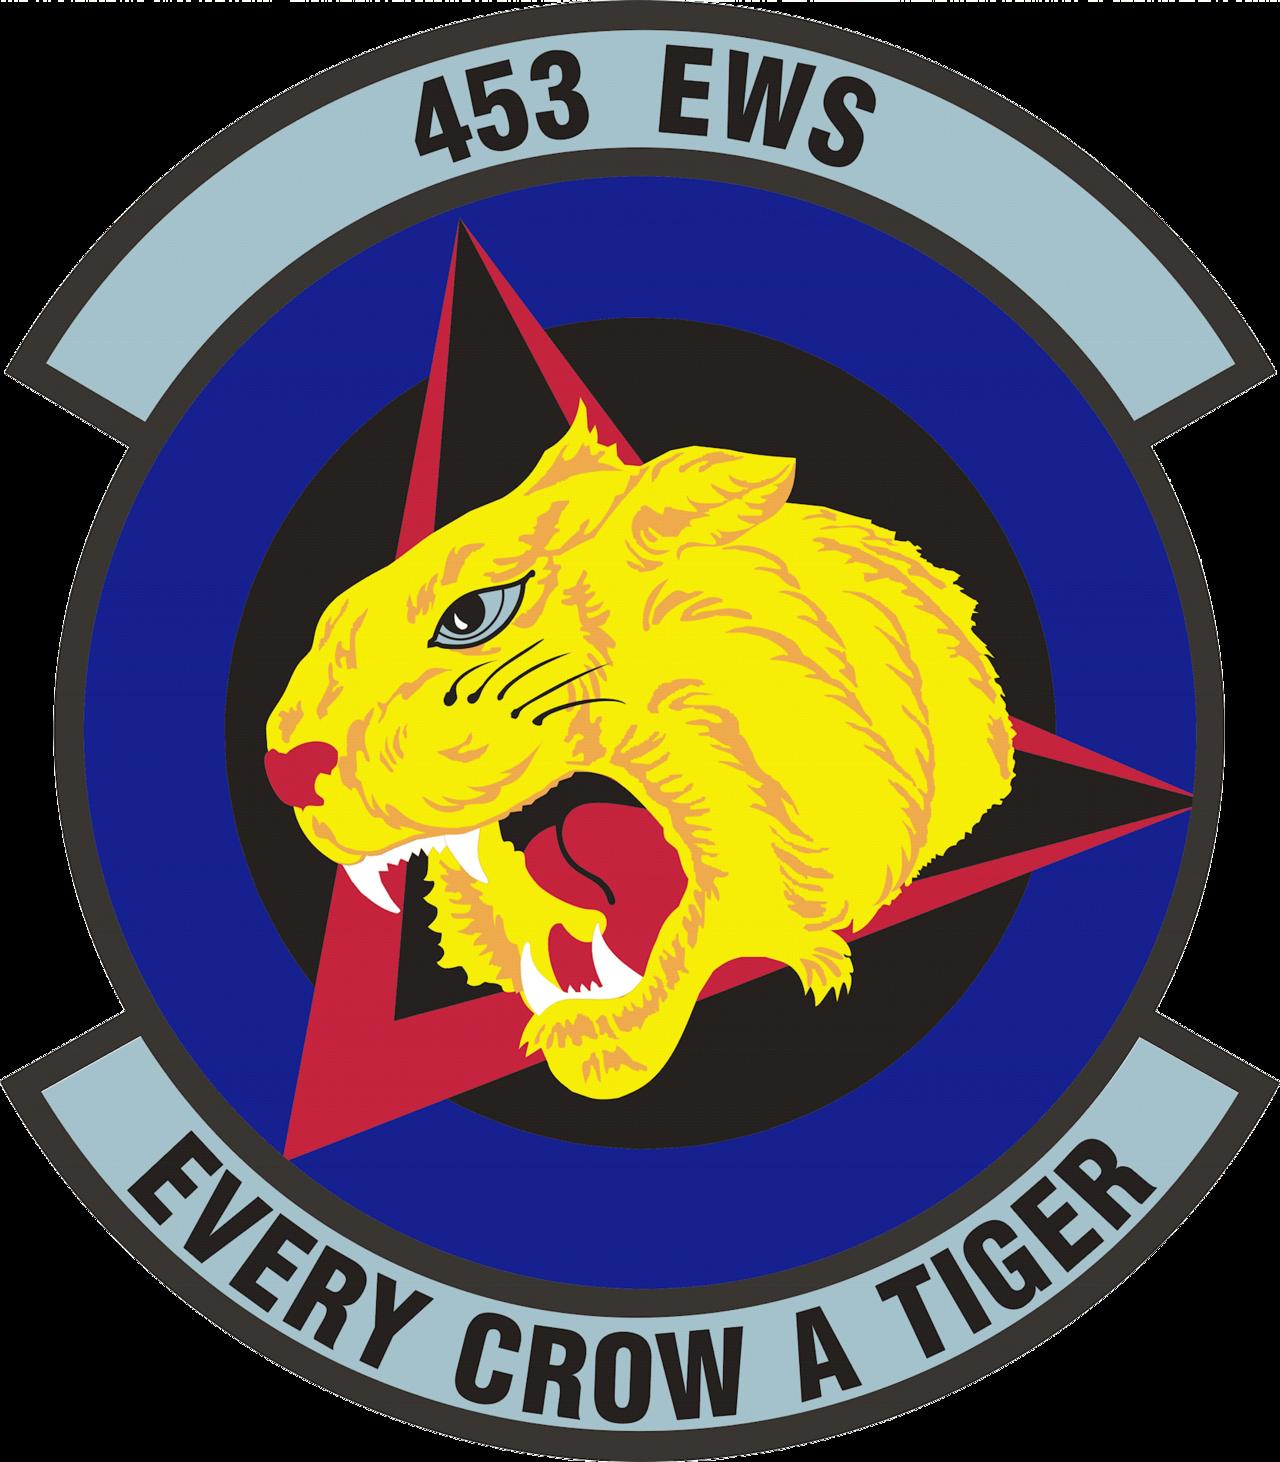 453d Electronic Warfare Squadron Wikipedia Lackland Air Force Base Warfare United States Air Force